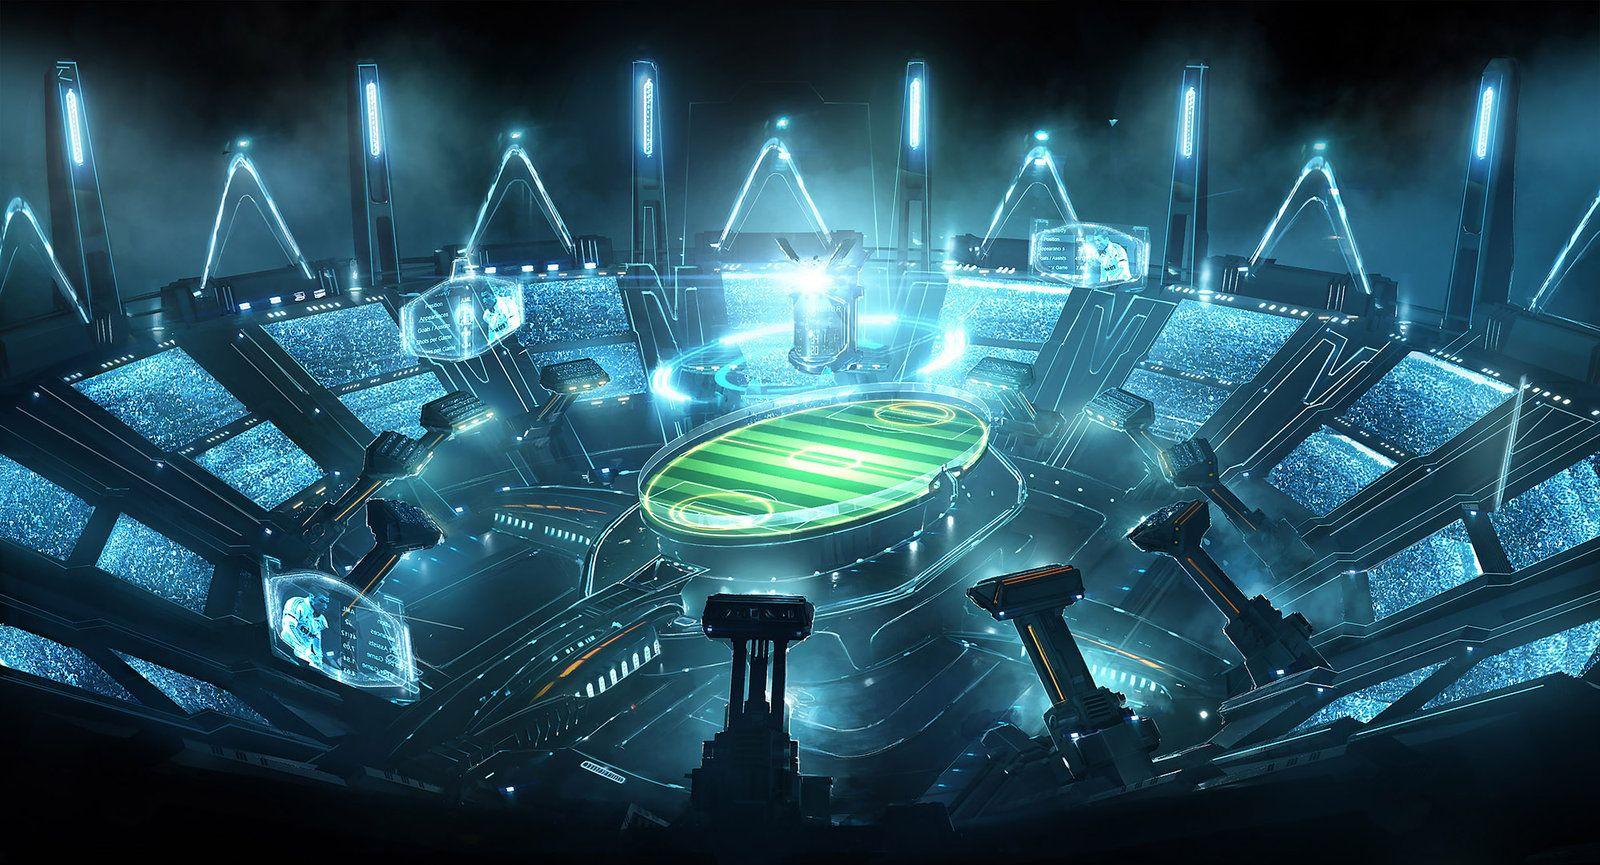 Samsung stadium by emanshiu.deviantart.com on @DeviantArt | U.G. Moodboard en 2019 | Sci fi ...